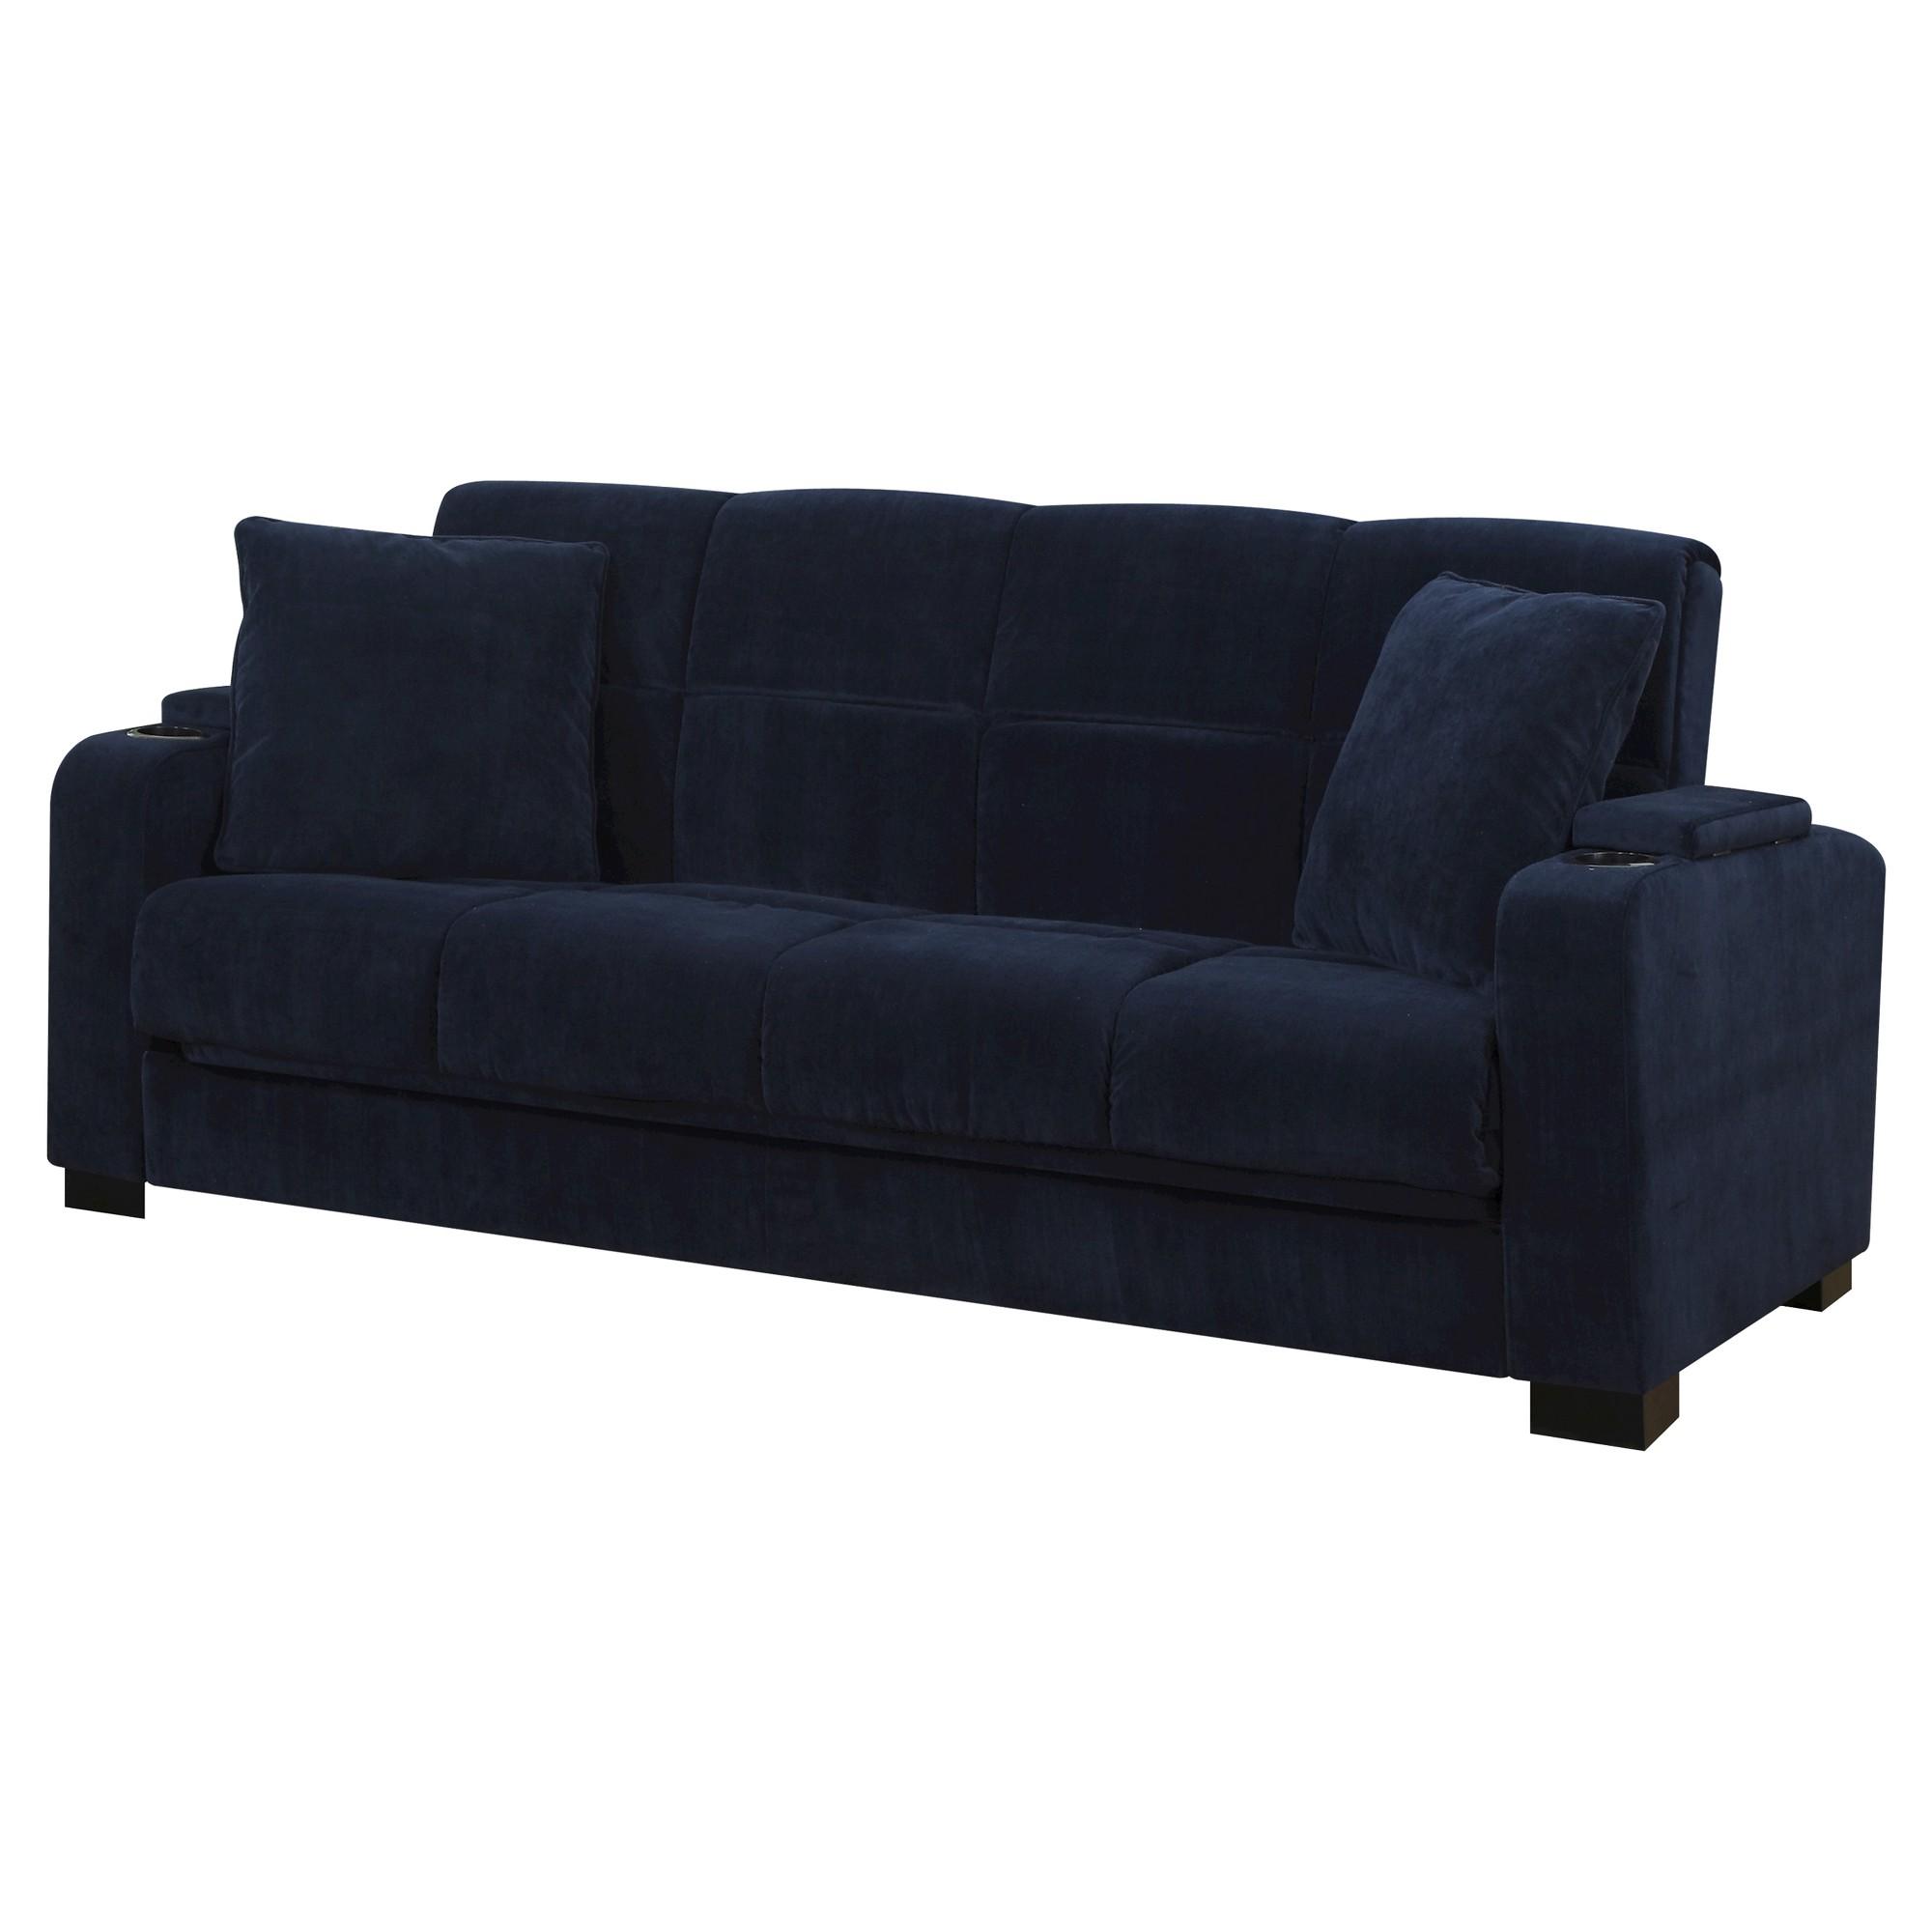 Susan Storage Arm Convert A Couch Navy Blue Velvet Handy